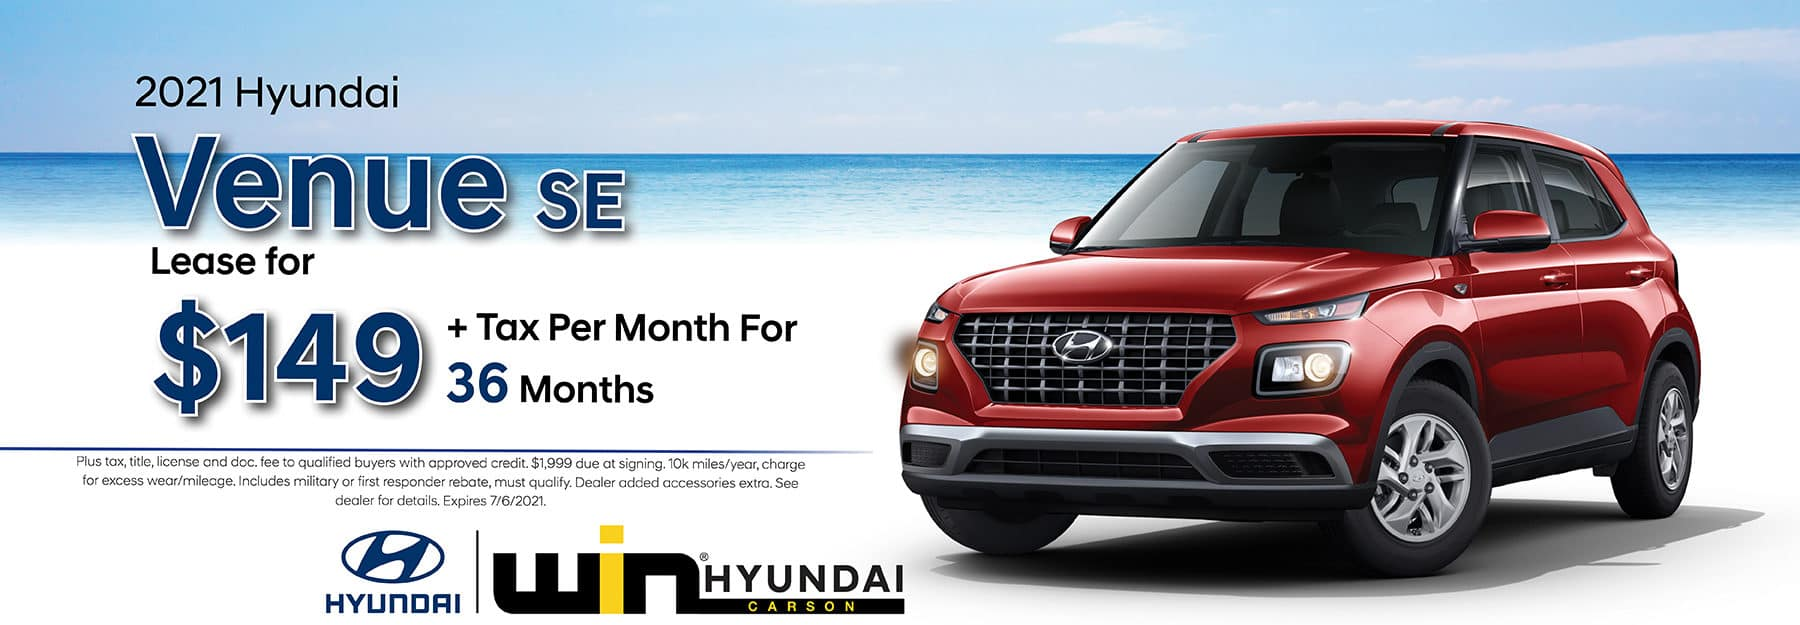 061.240.01_WIN_Hyundai_Carson_1800x625_Venue_Dealer Web